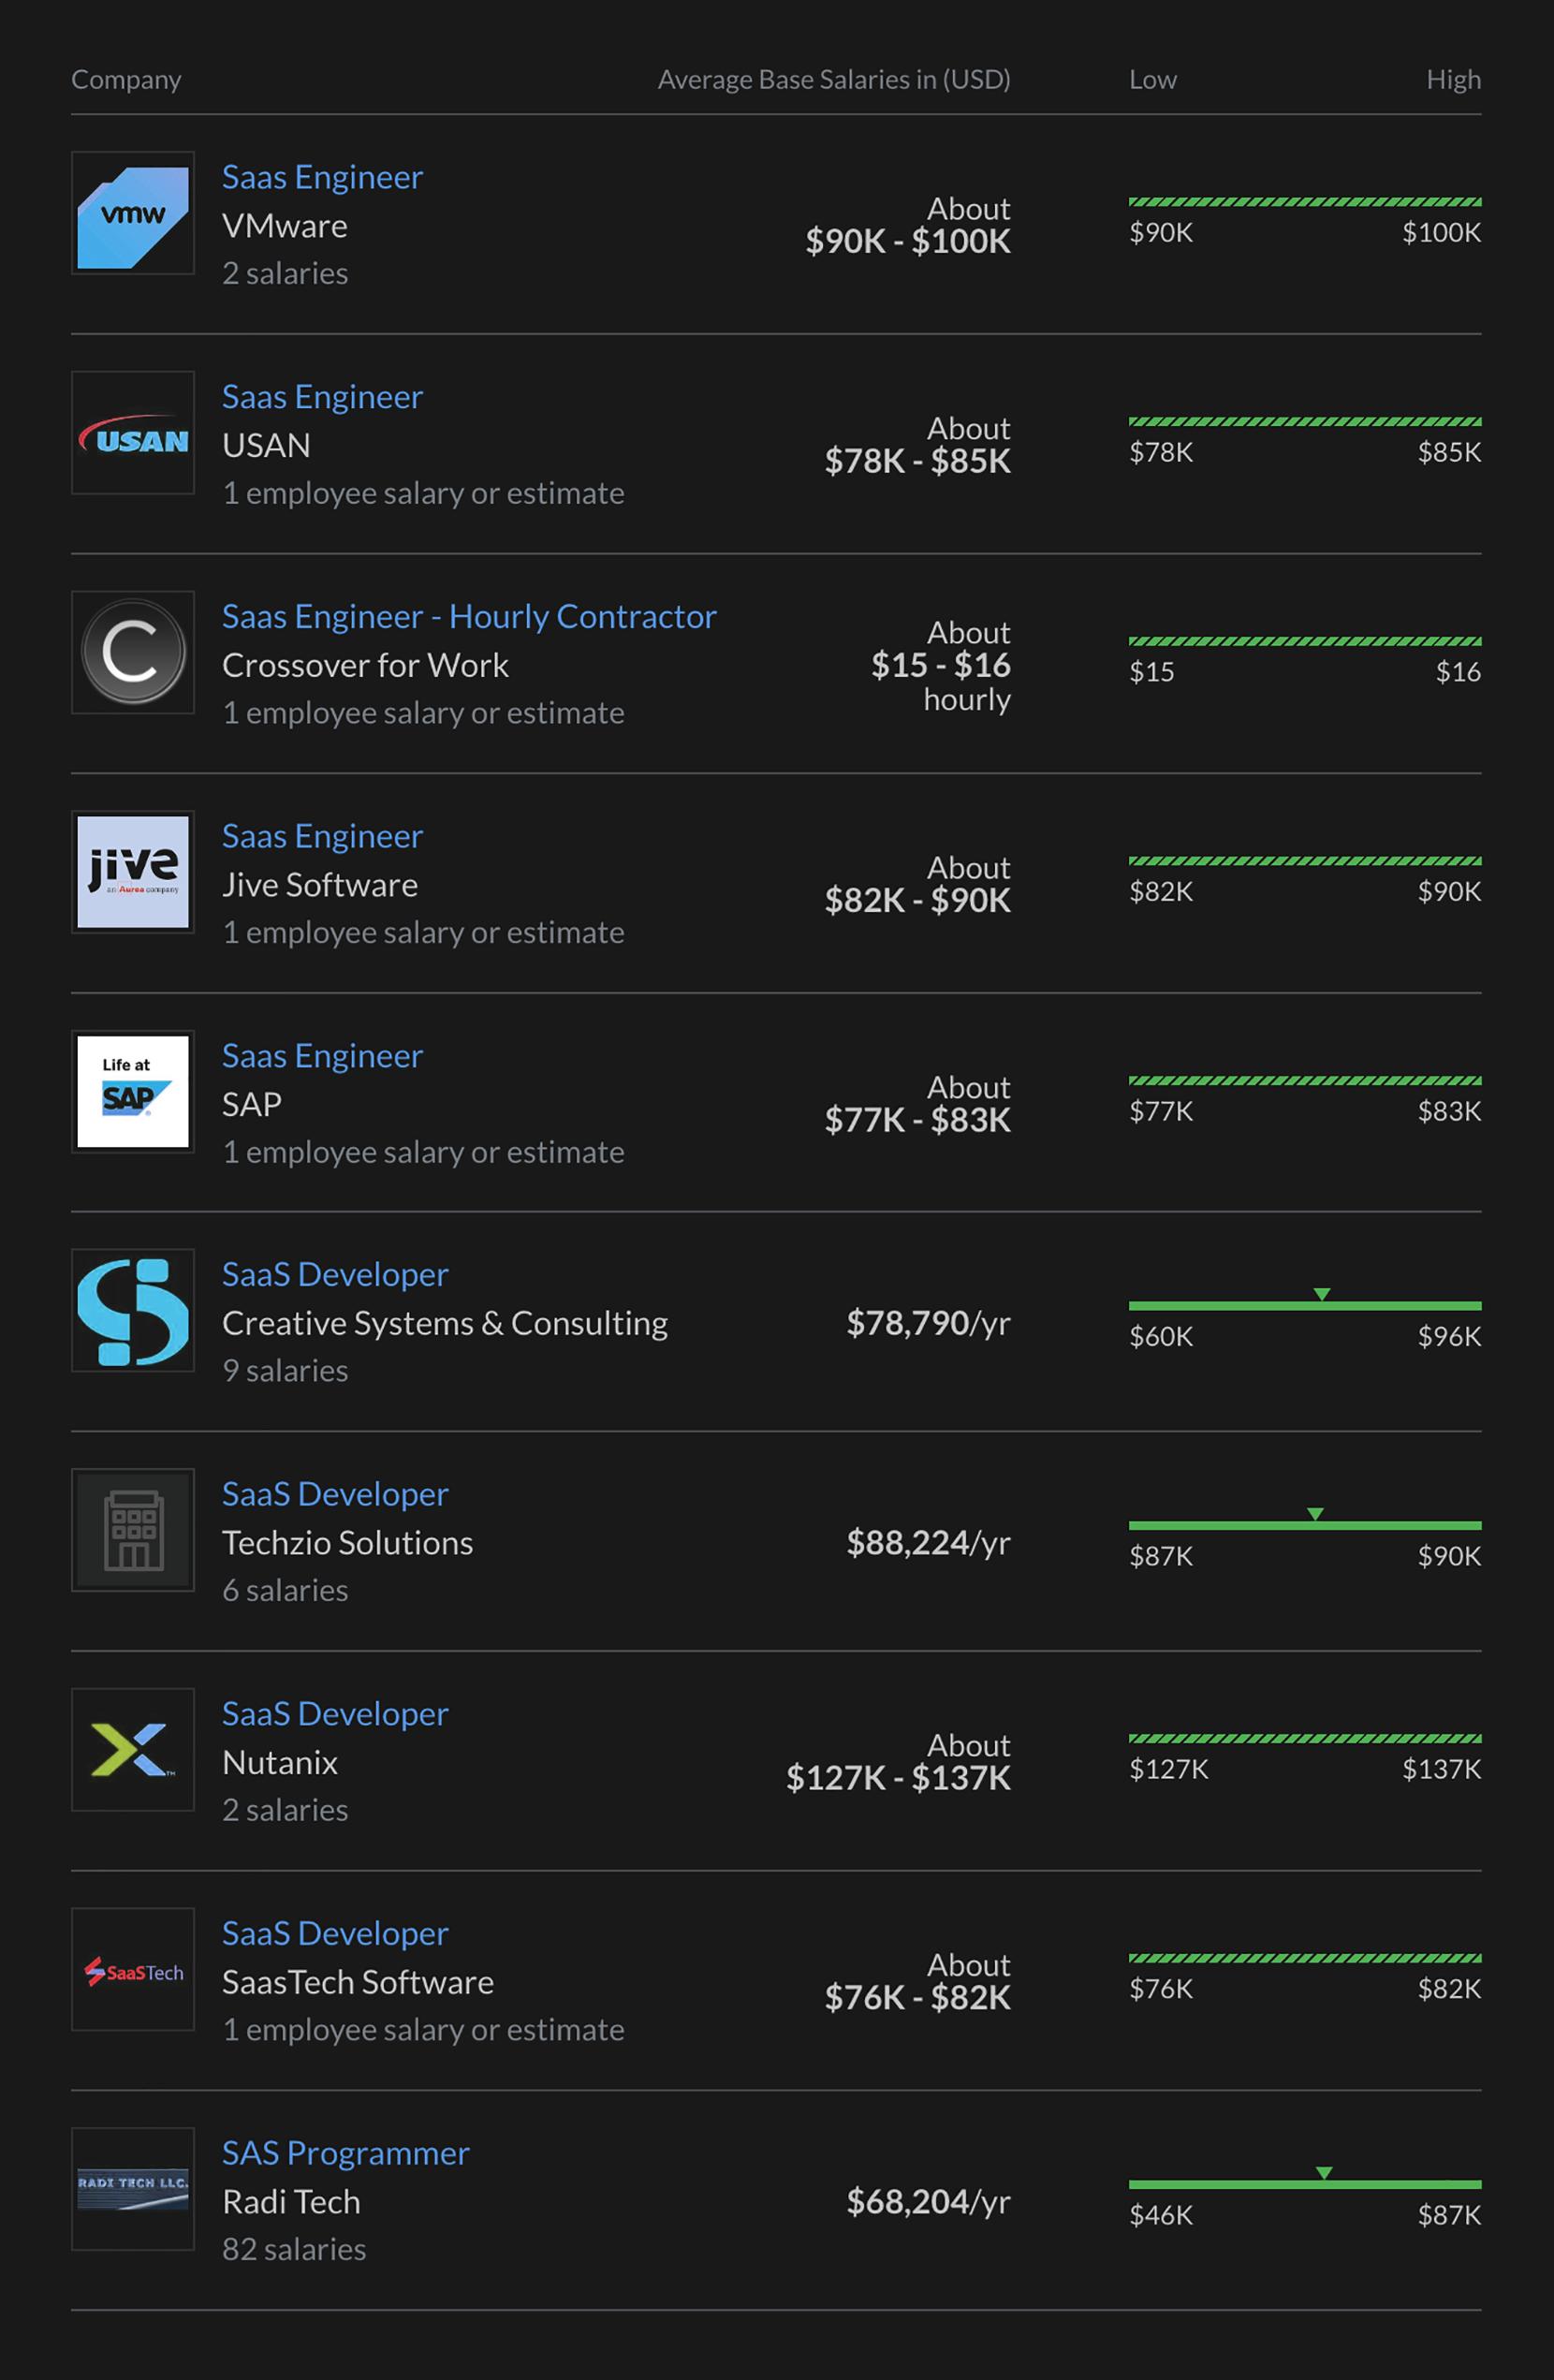 Average salary for a SaaS developer